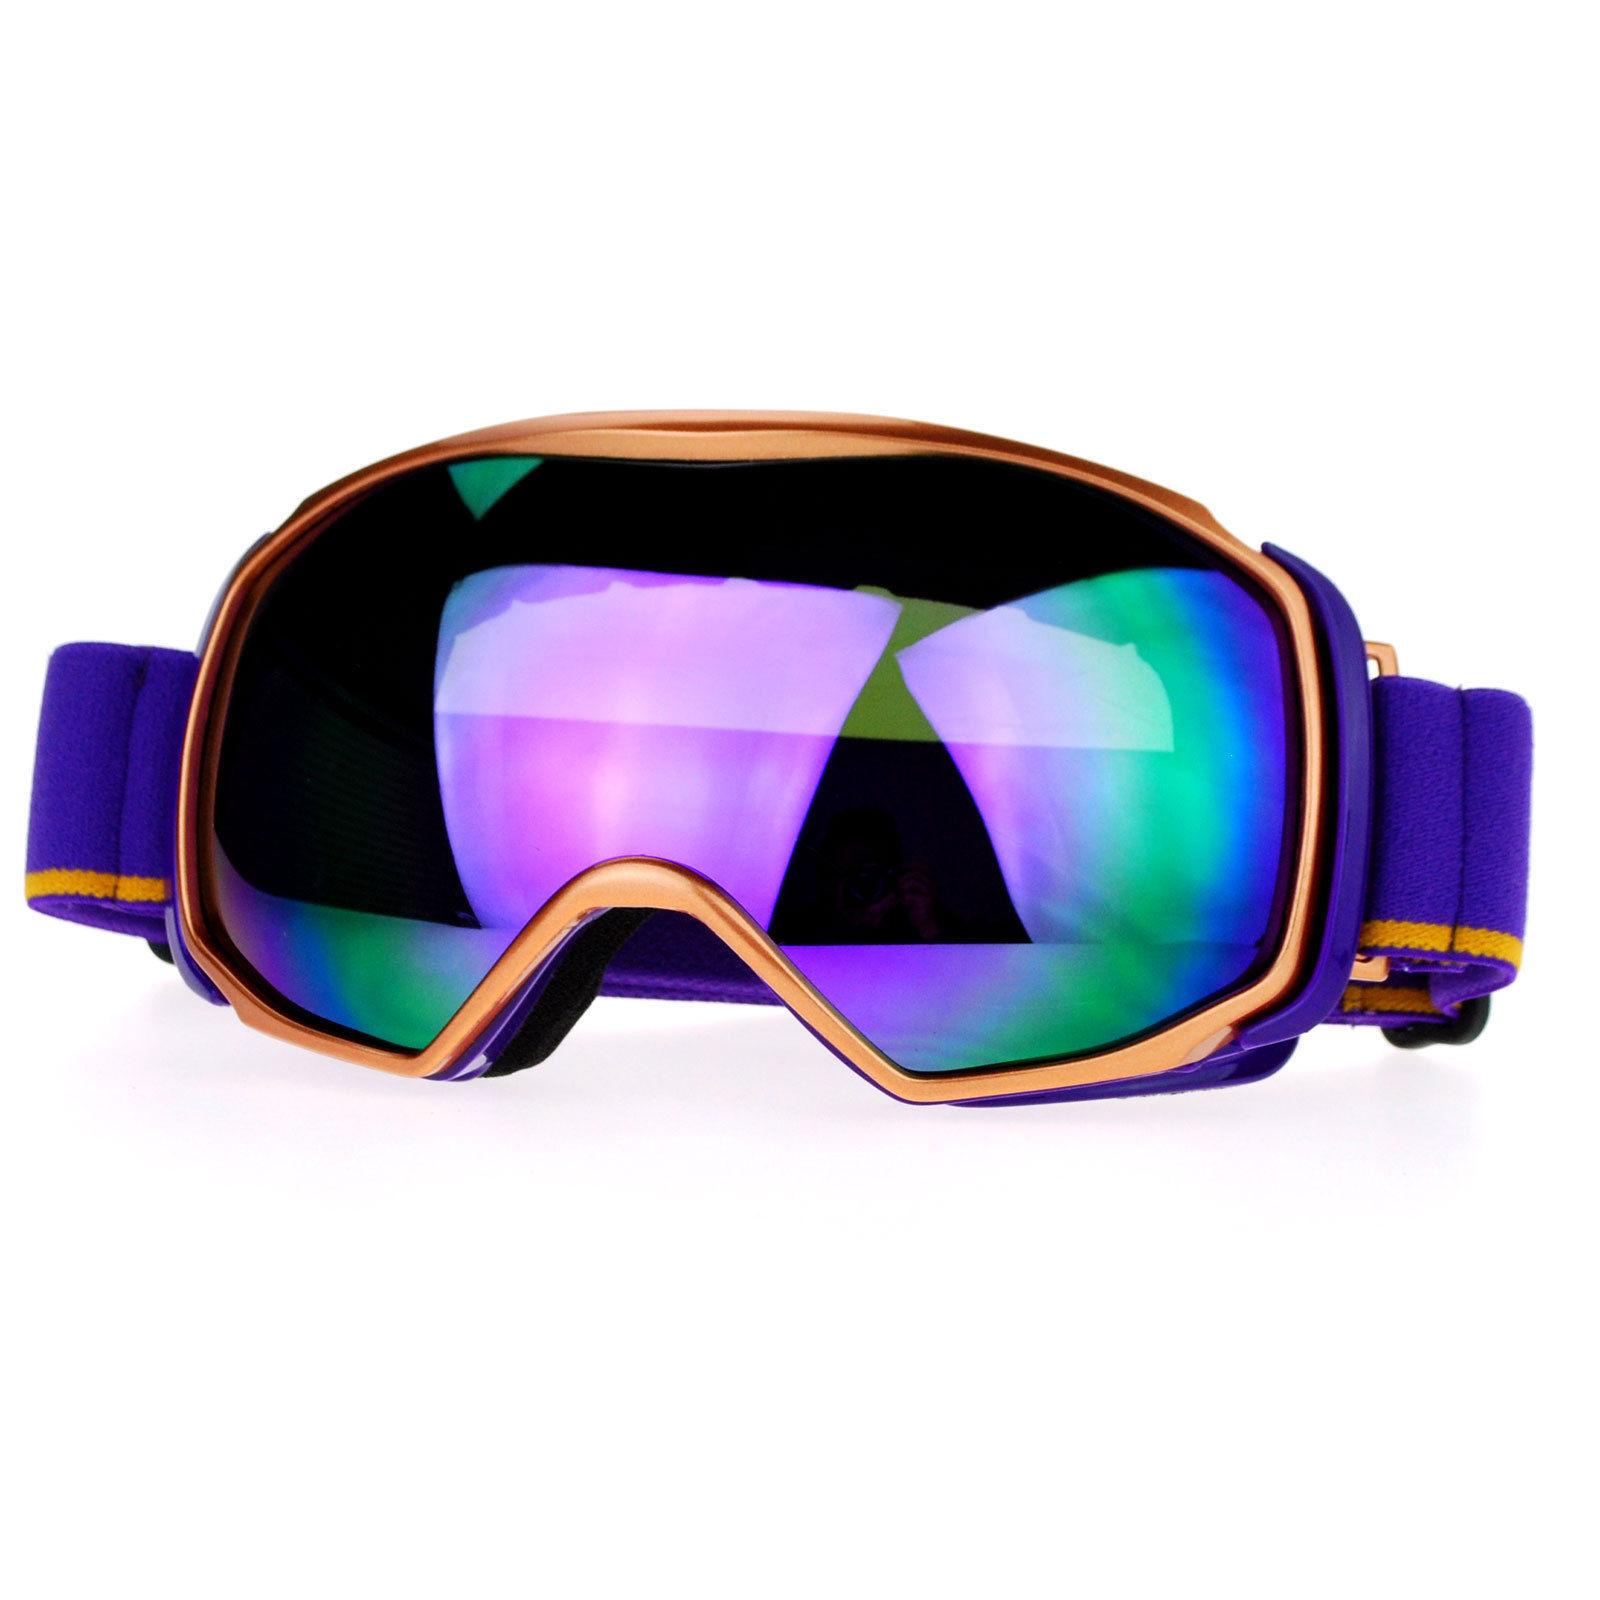 82d7fb69123a 57. 57. Previous. Snowboard Ski Goggles Sports Goggle Color Mirror Antifog  Double Lens. Snowboard Ski Goggles Sports Goggle ...